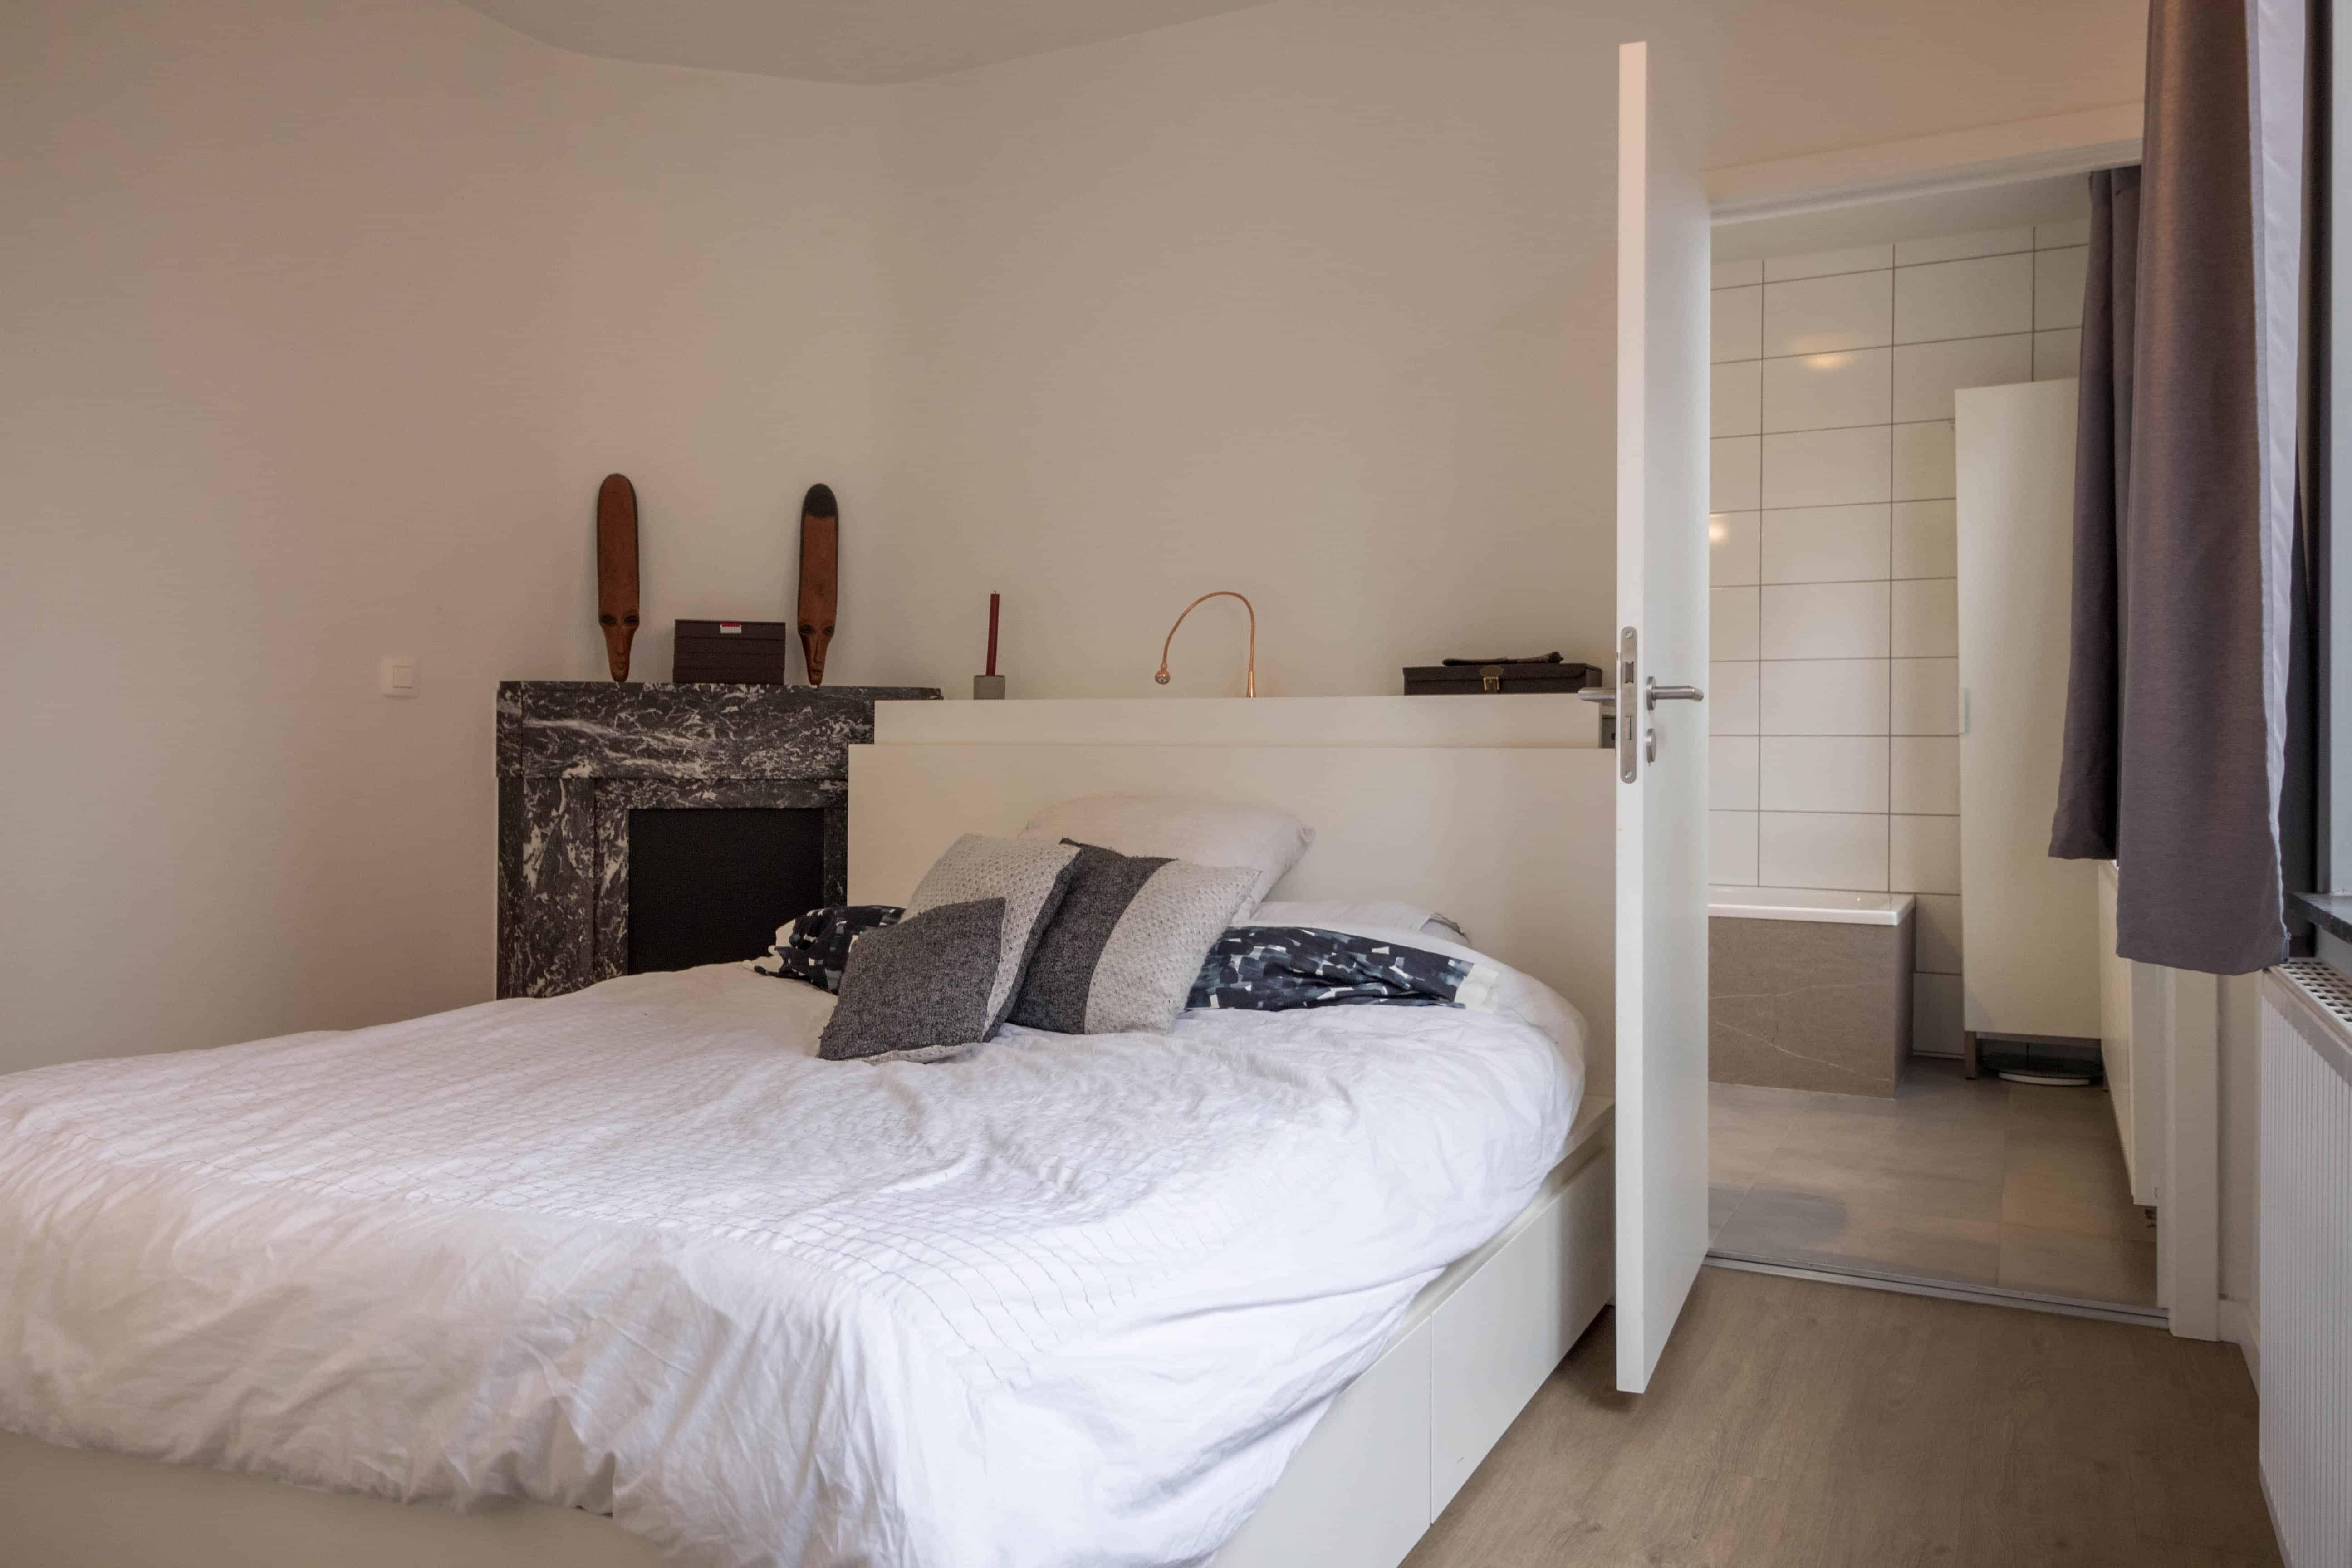 Interieur foto slaapkamer woning in Hasselt